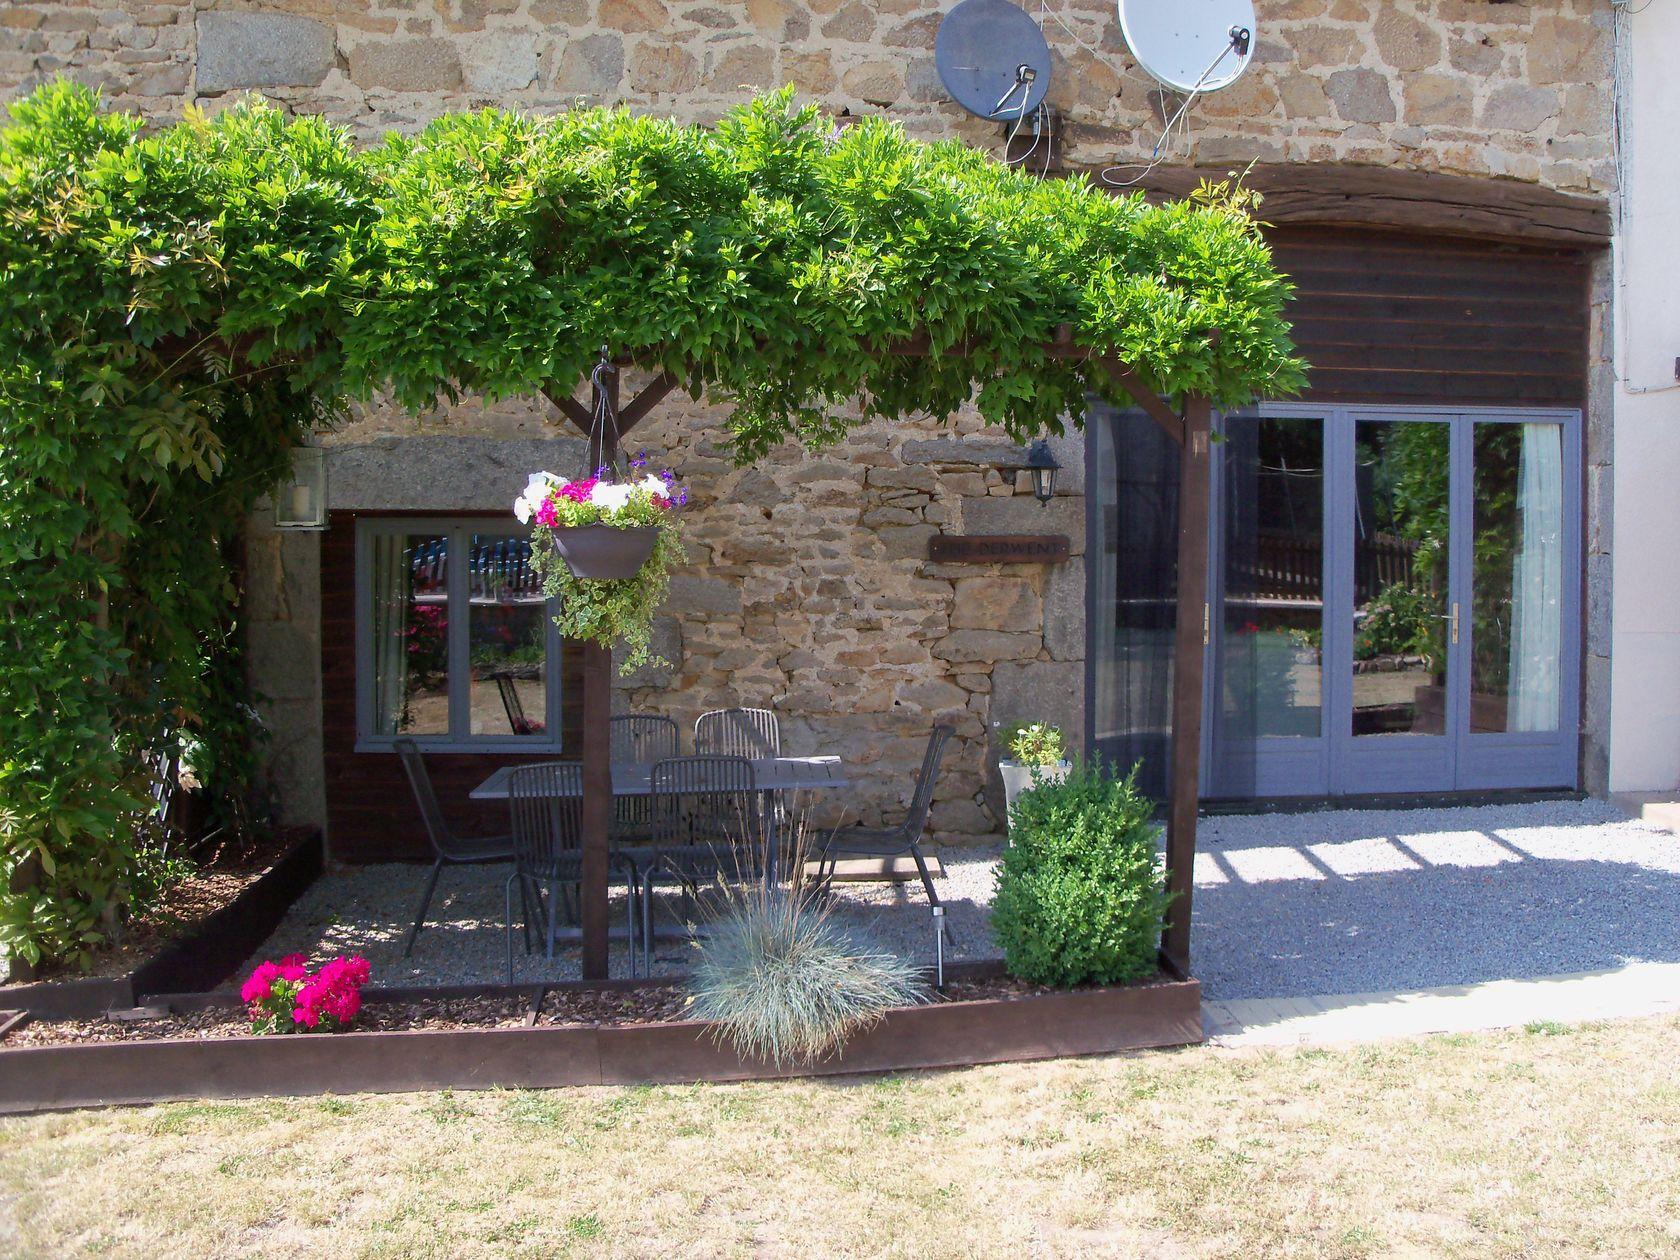 Chez Paille Gites - Derwent Gite